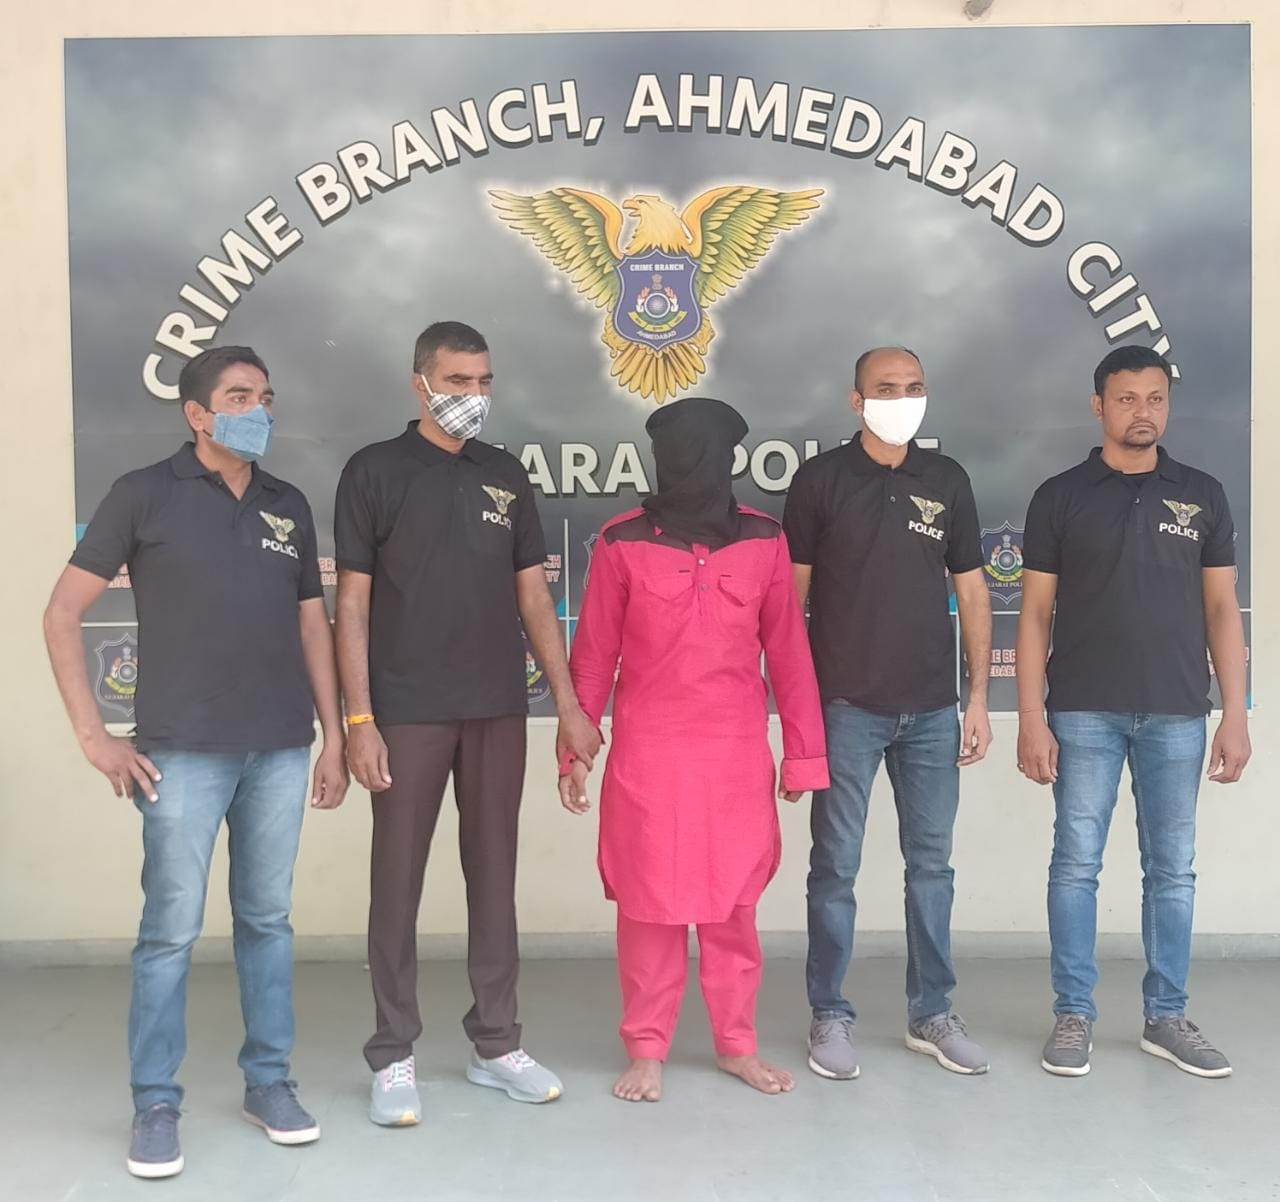 Mazhar Qureshi Killed ShahRukh in Danilimda Ahmedabad throws head and body in Lake